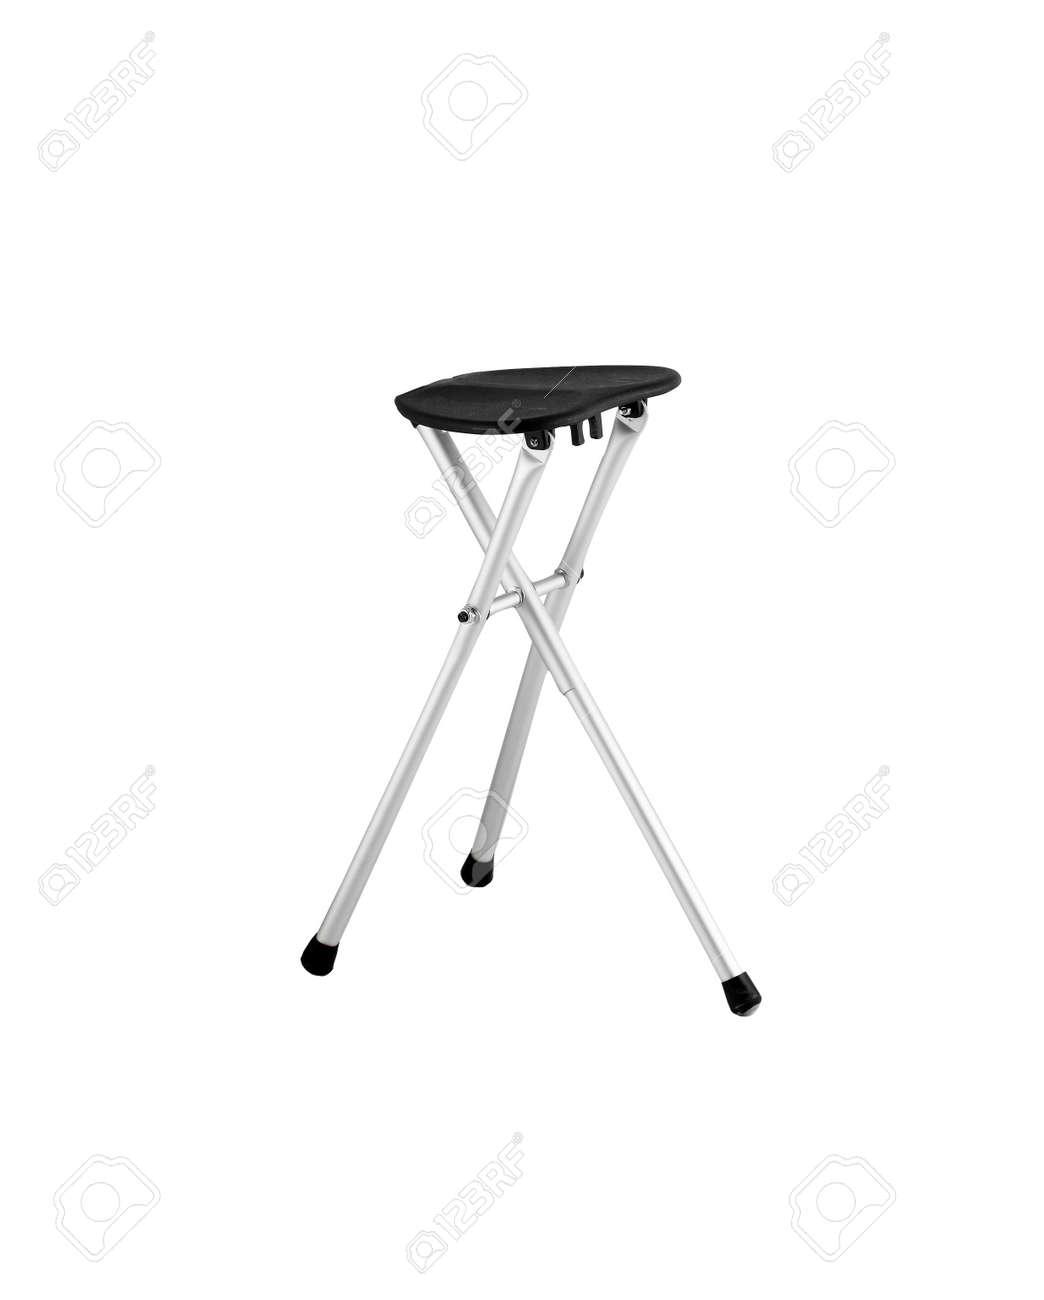 Peachy Shiny Metal And Black Leather Bar Stool Isolated On White Creativecarmelina Interior Chair Design Creativecarmelinacom